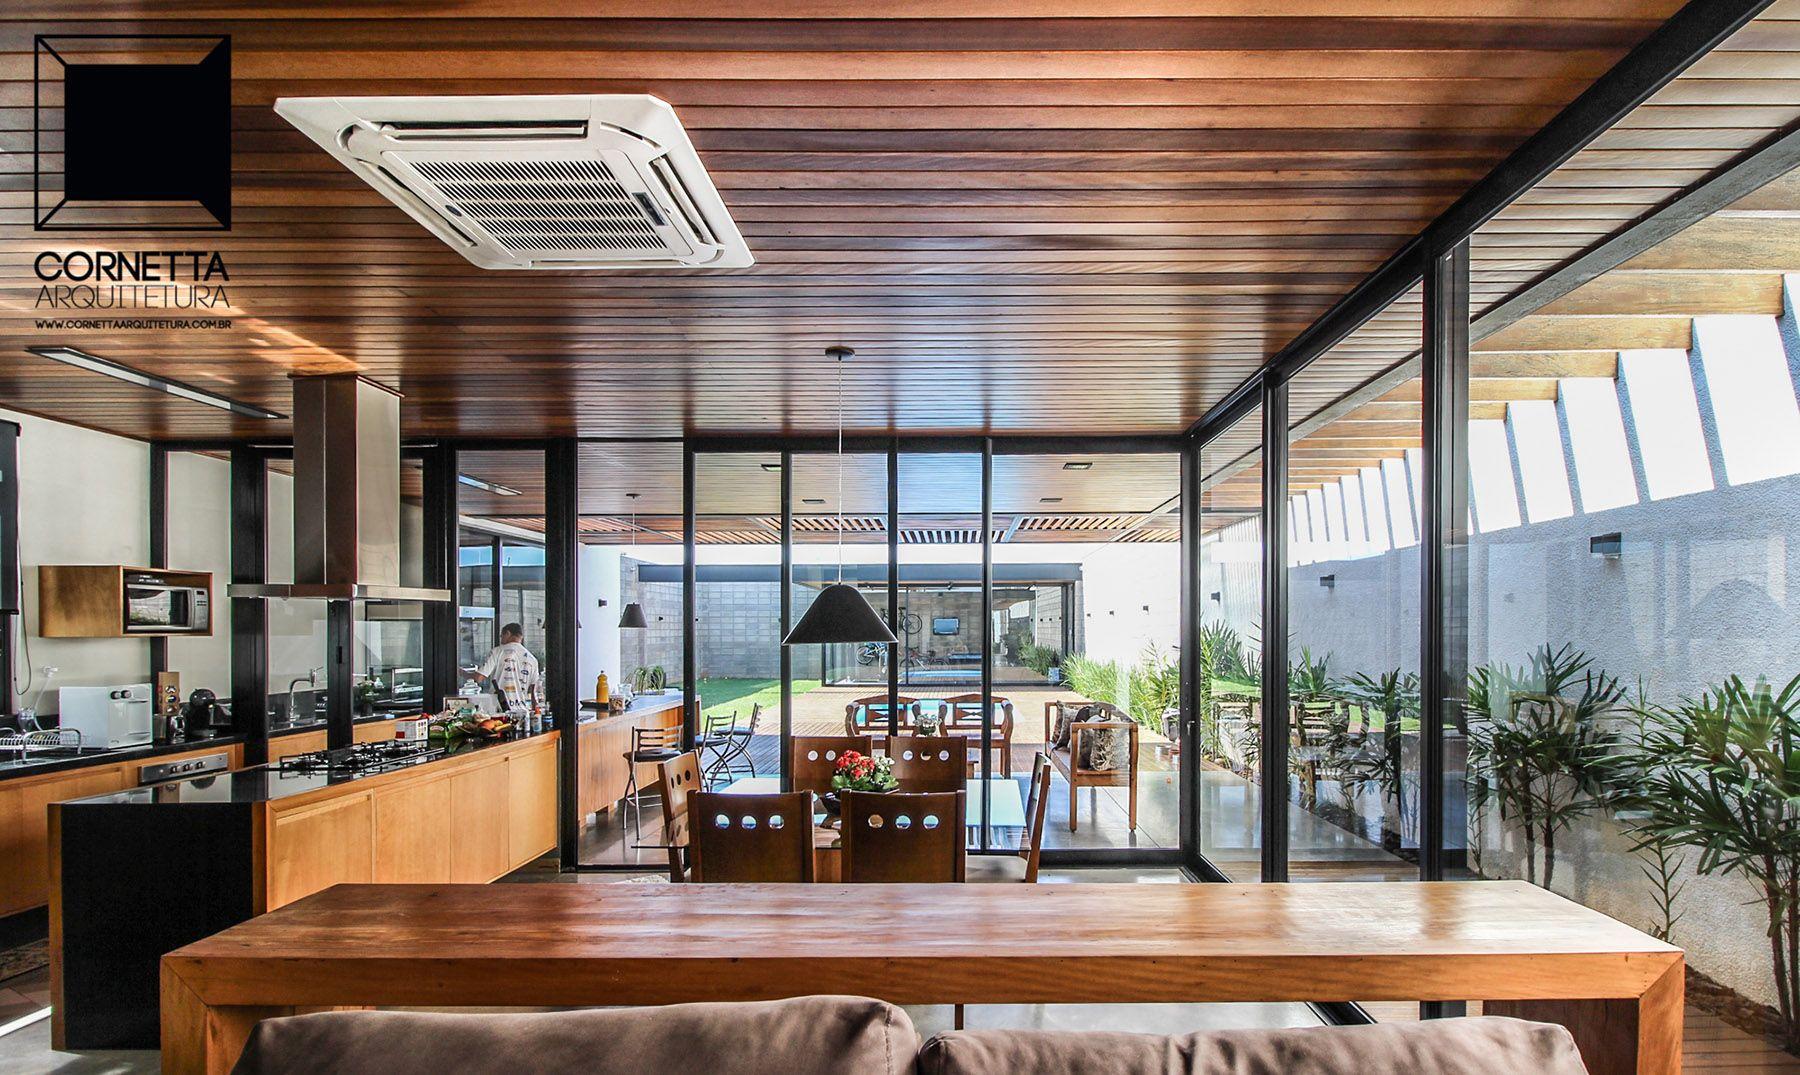 Cornetta Arquitetura Casas Estruturas Metalicas Casas T Rreas